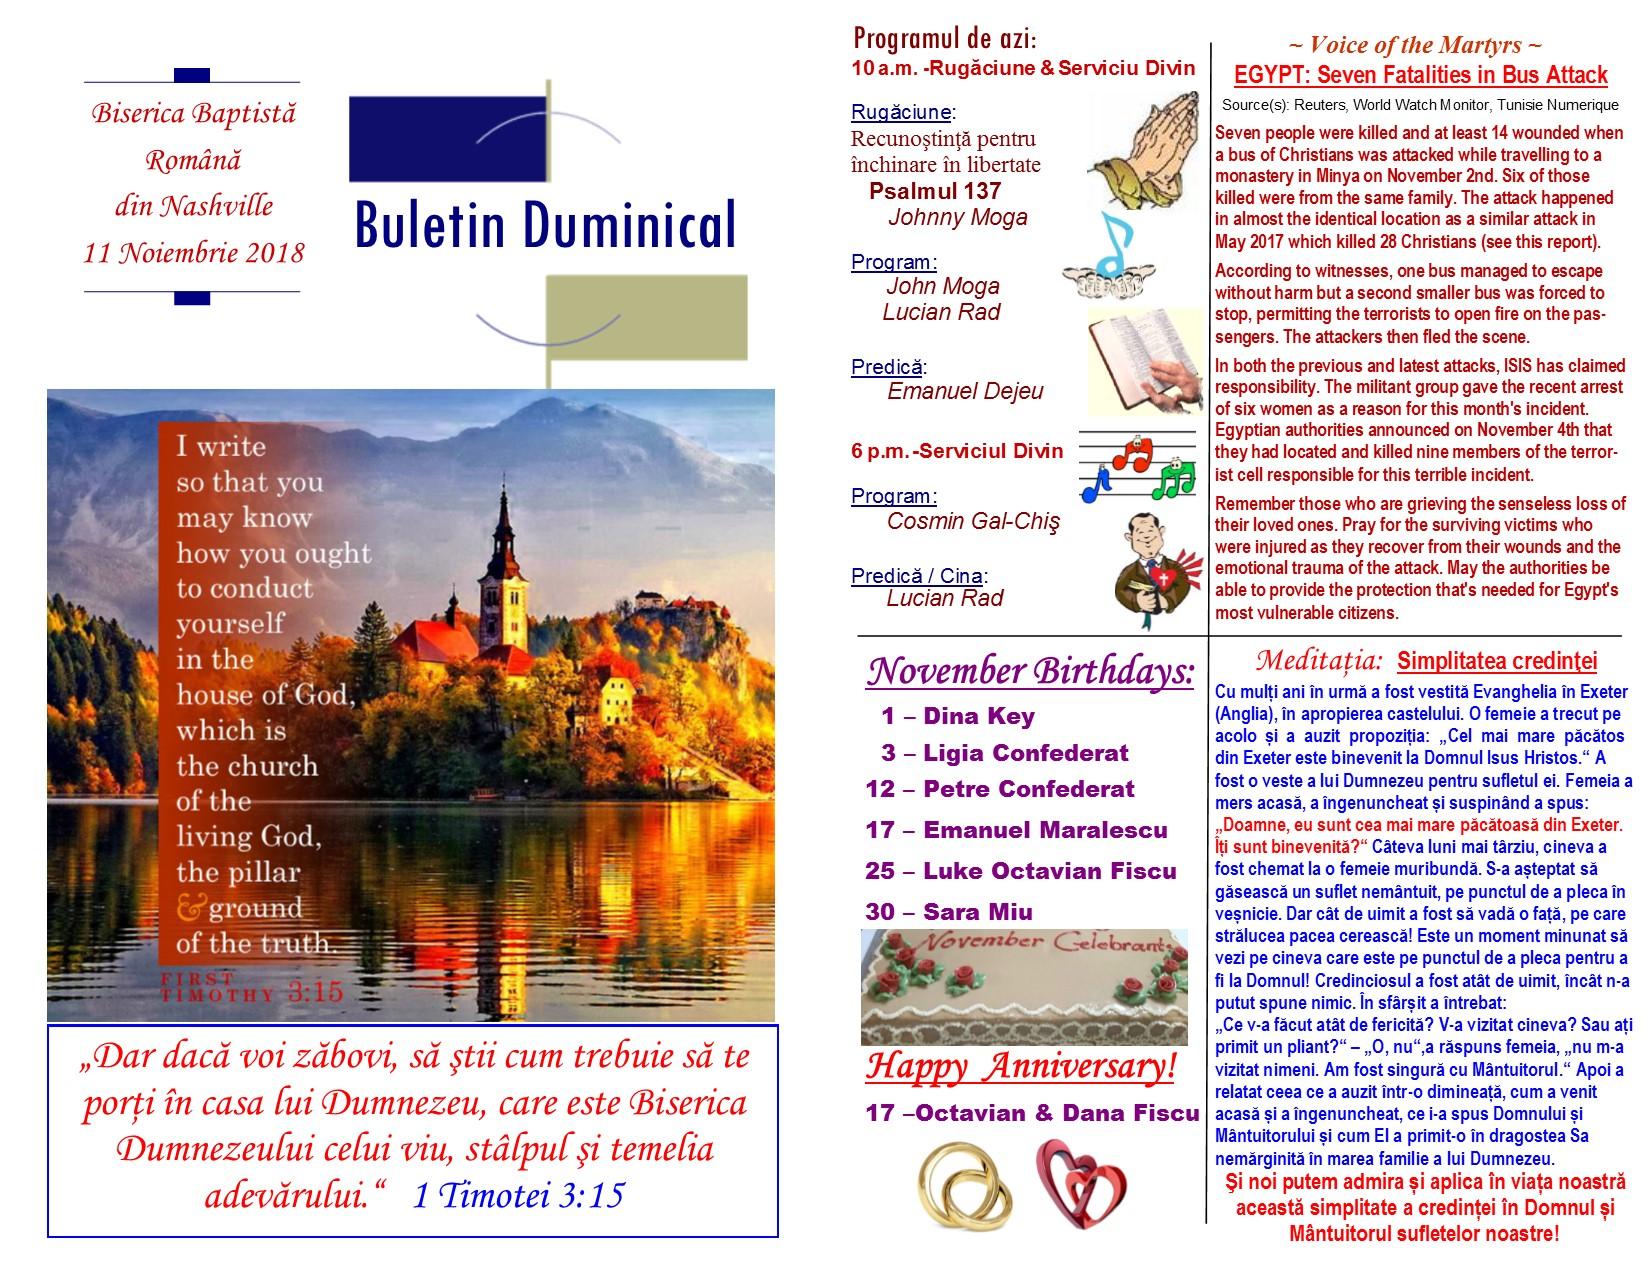 Buletin 11-11-18 page 1 & 2